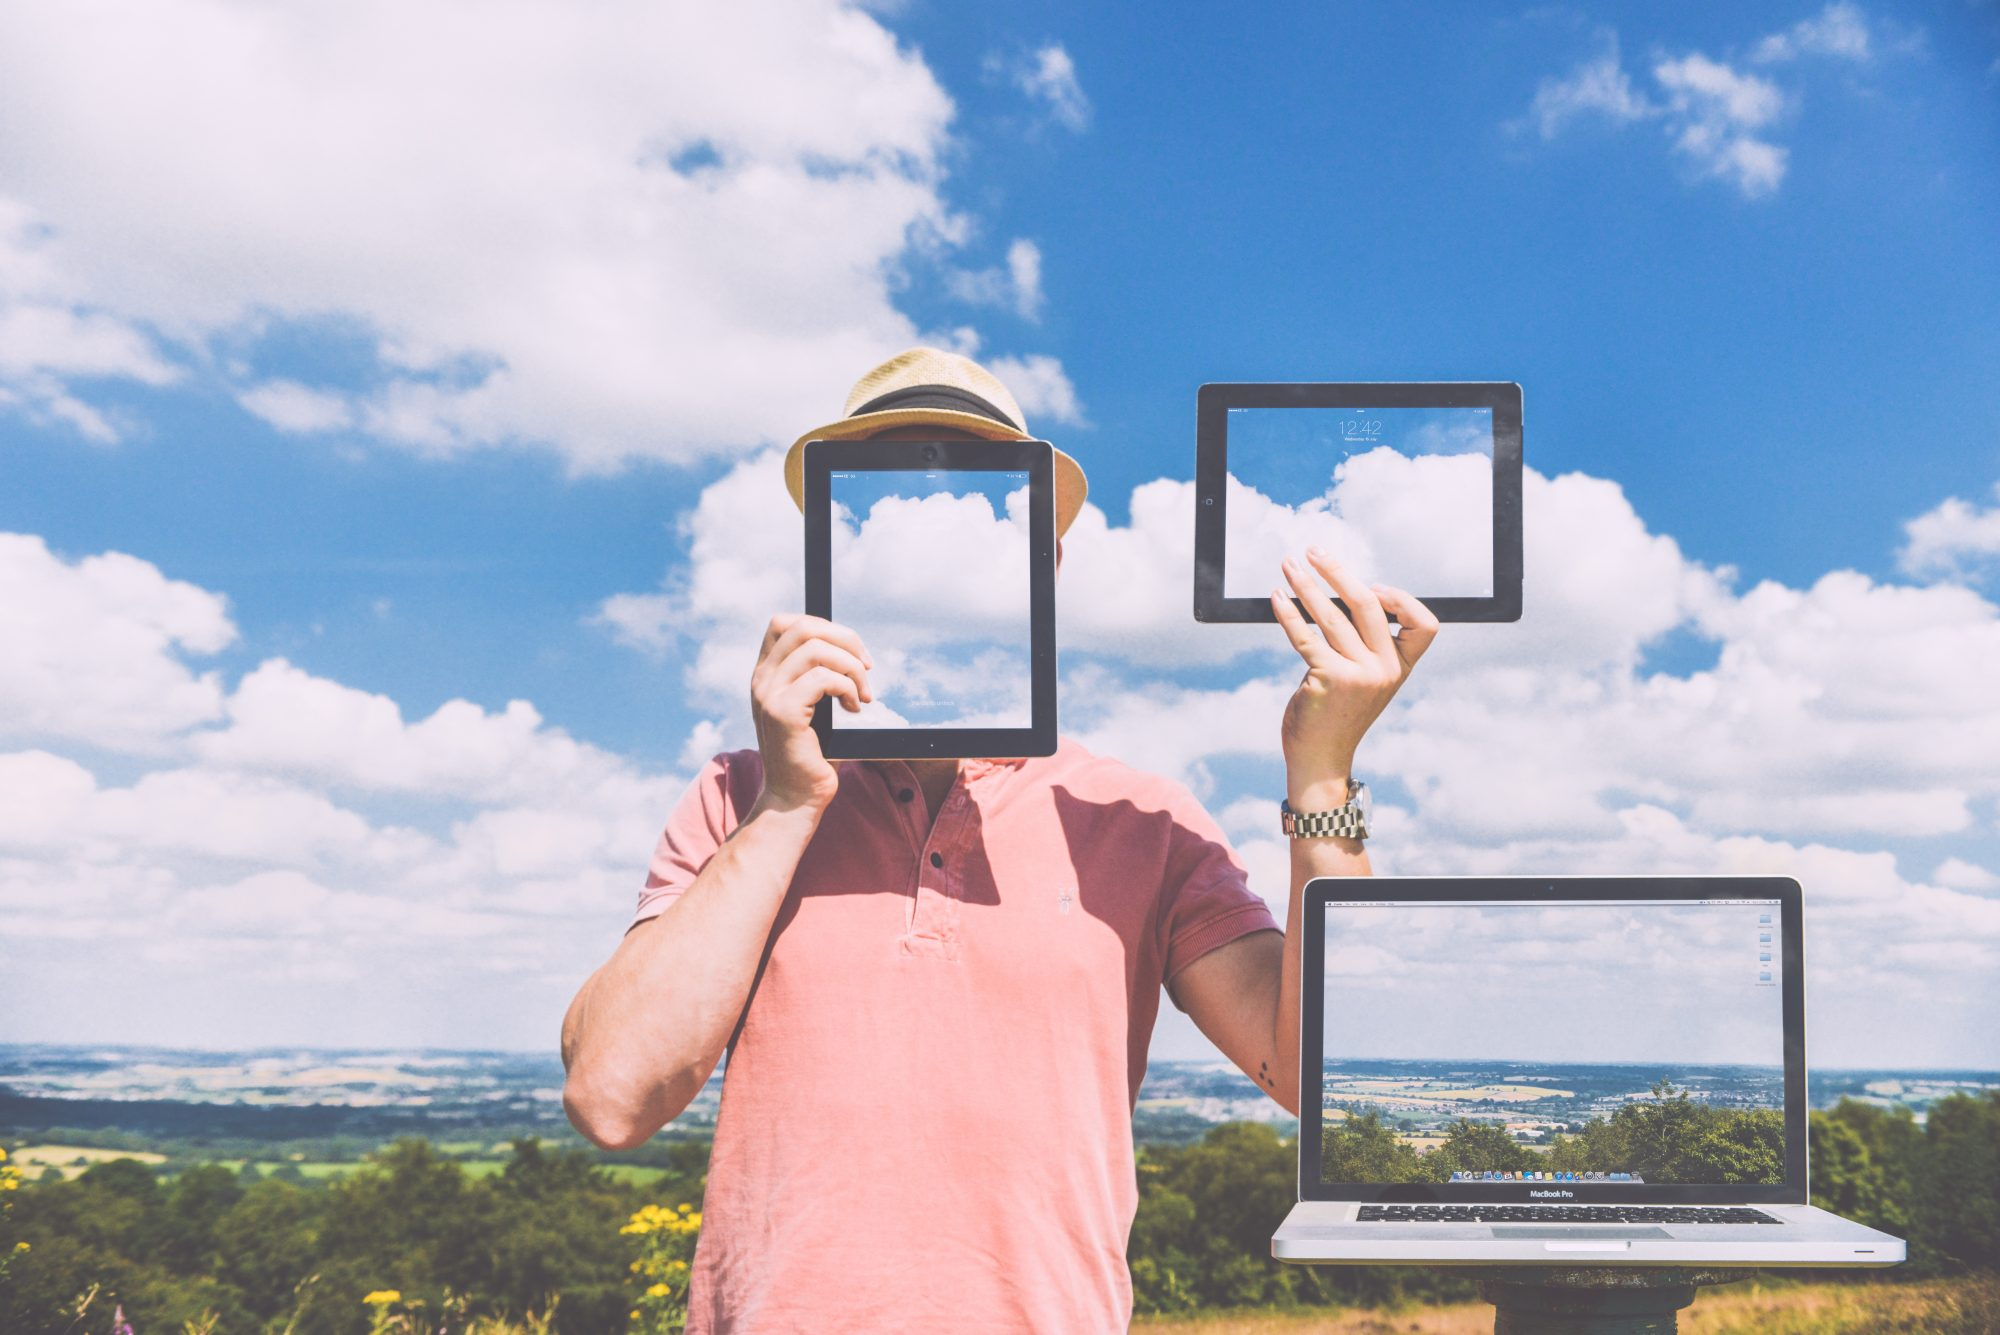 digital marketing, email marketing, website design